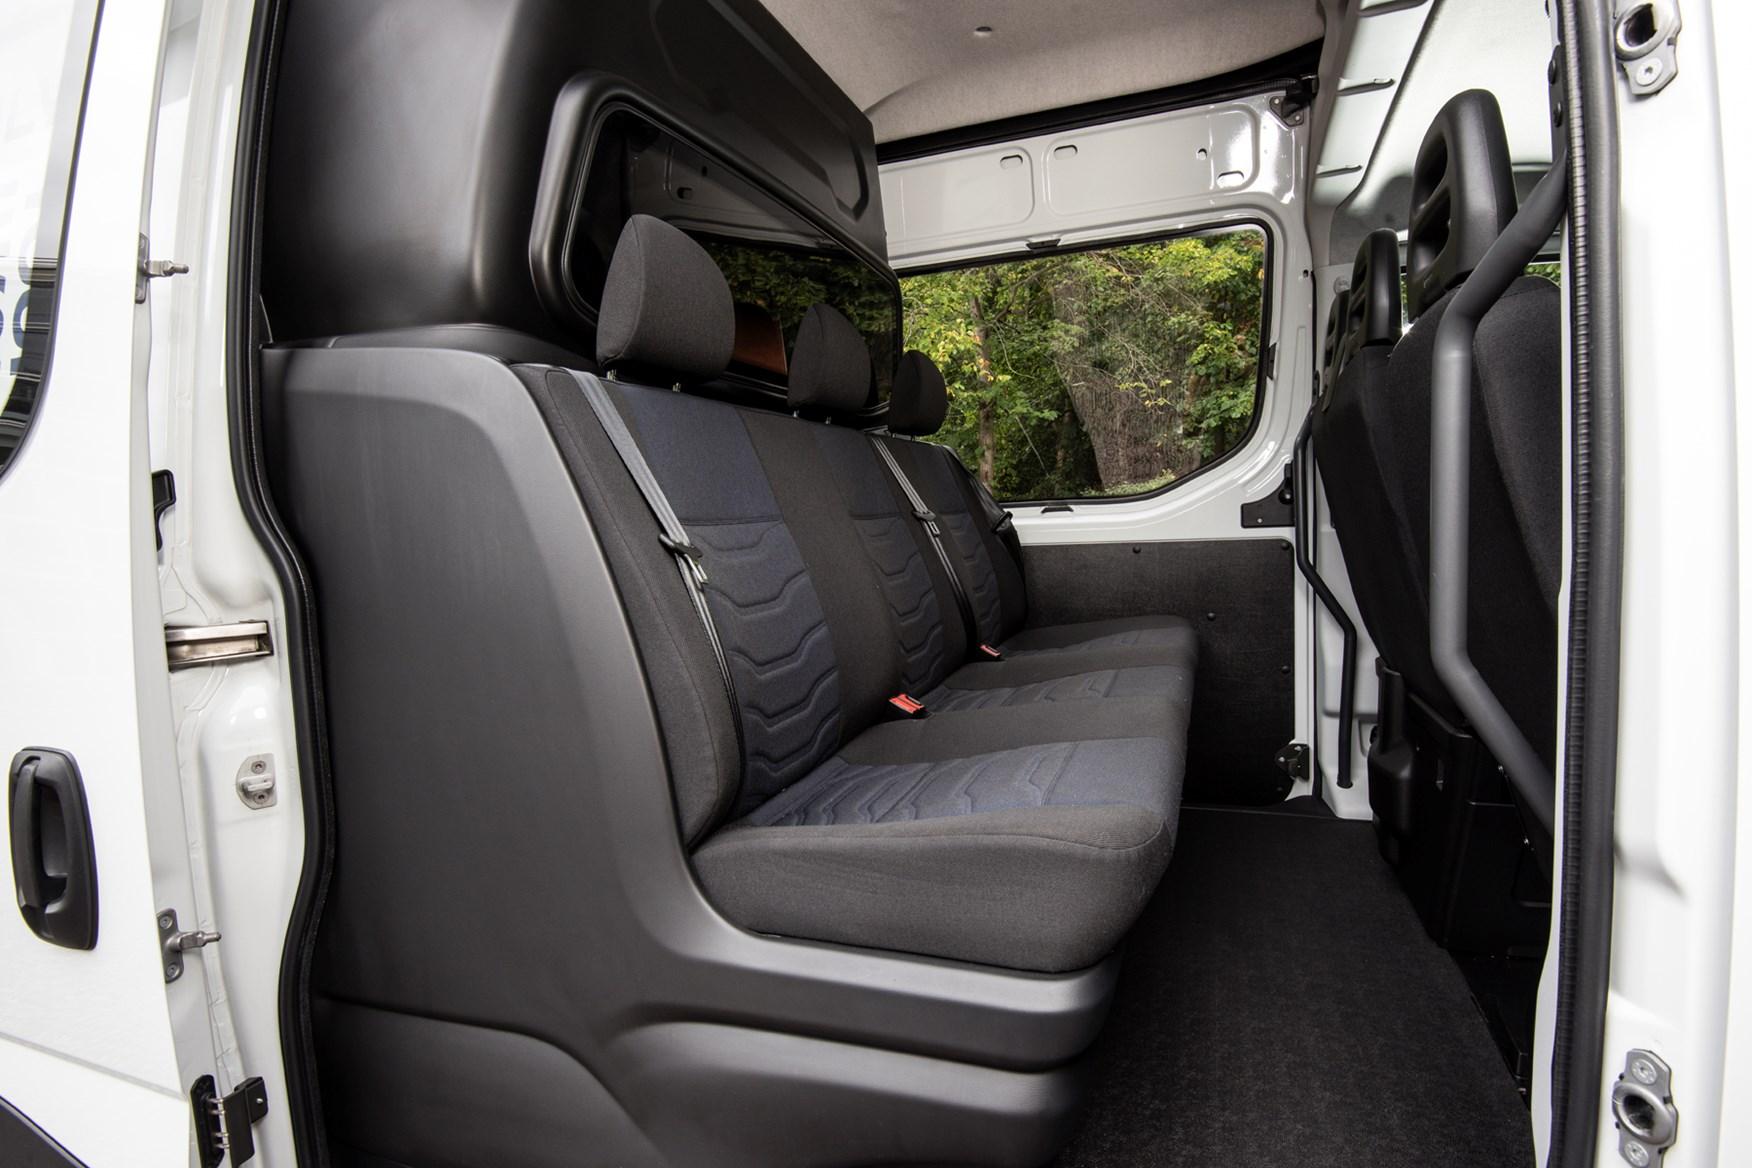 2021 Iveco Daily 3.5t CrewVan rear seats